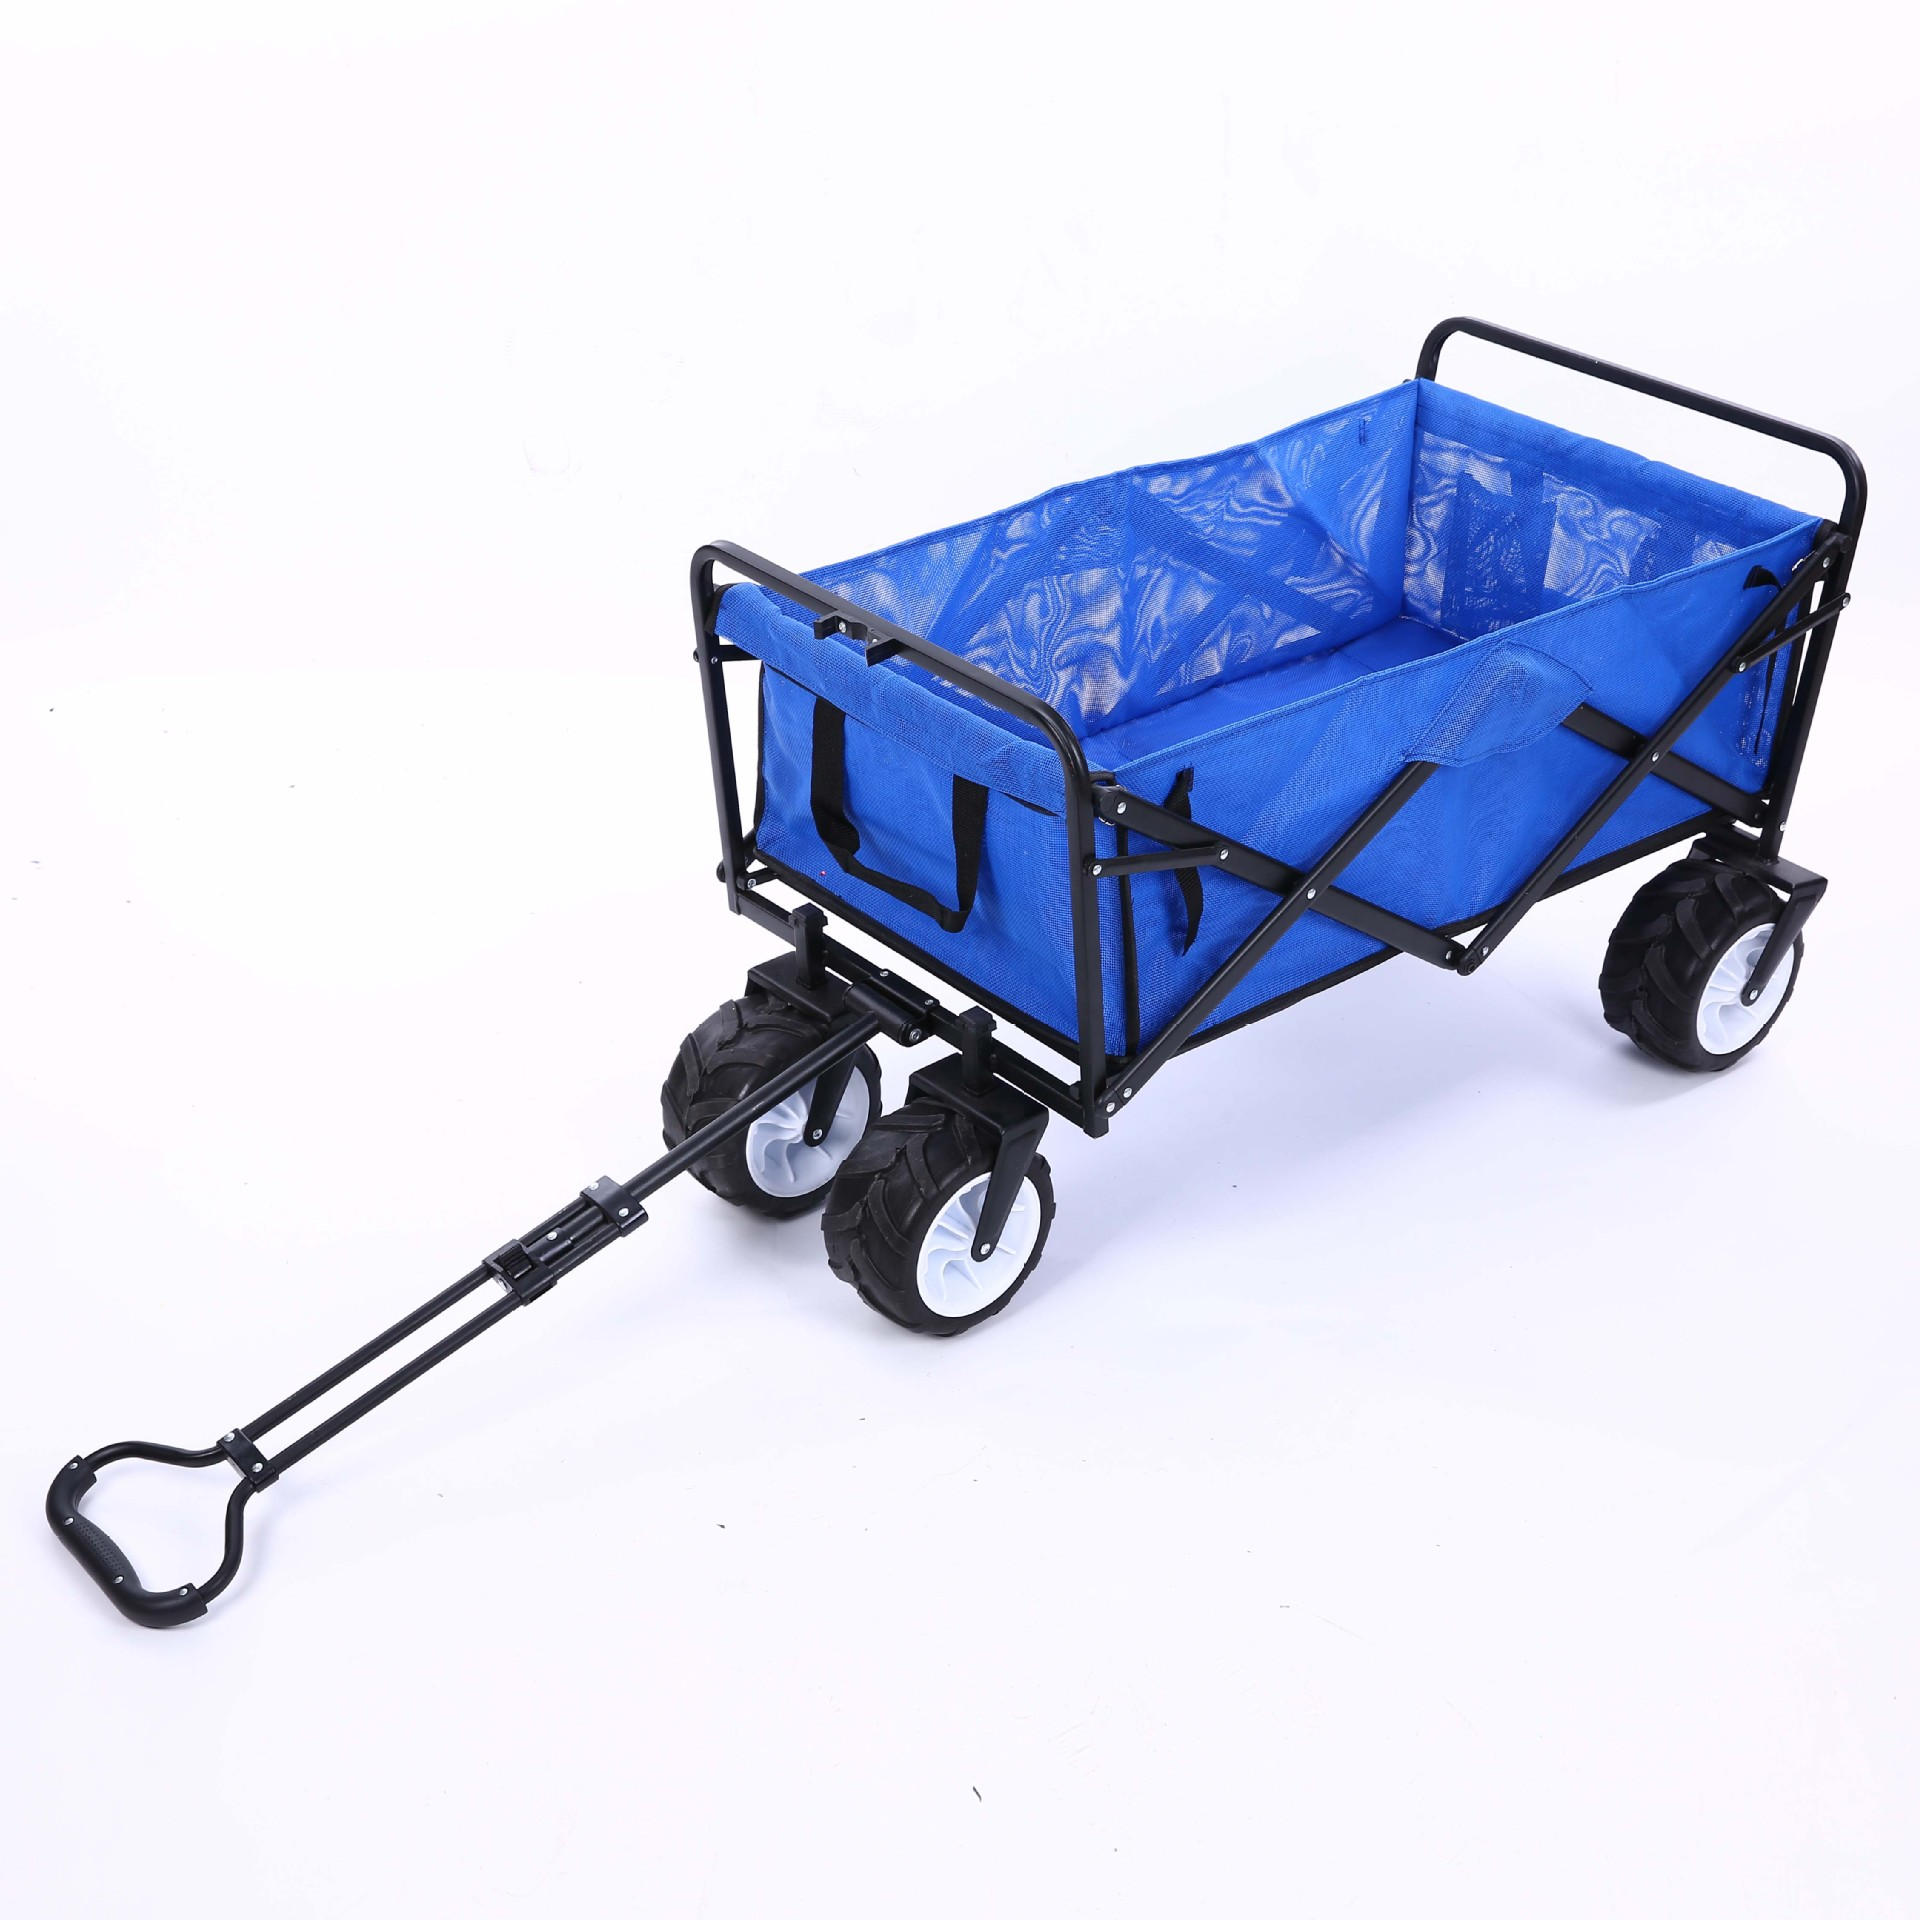 все цены на Blue Big Wheel Trolley Cart Folding Shopping Cart Luggage Outdoor Camping Fishing Gear Four Wheel Trailer a5334